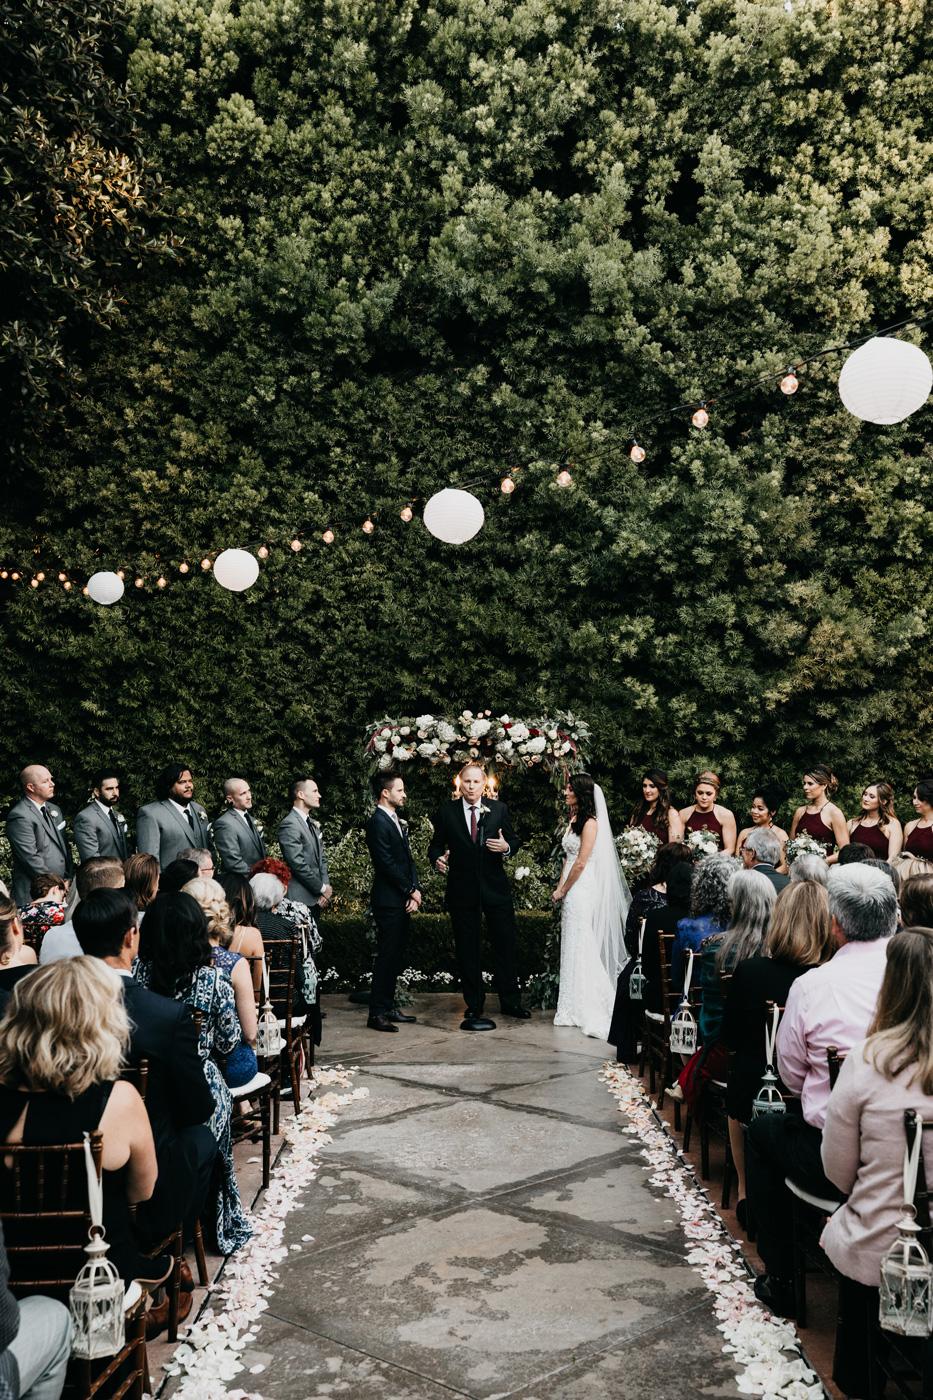 Laura&Don_Ceremony119.jpg